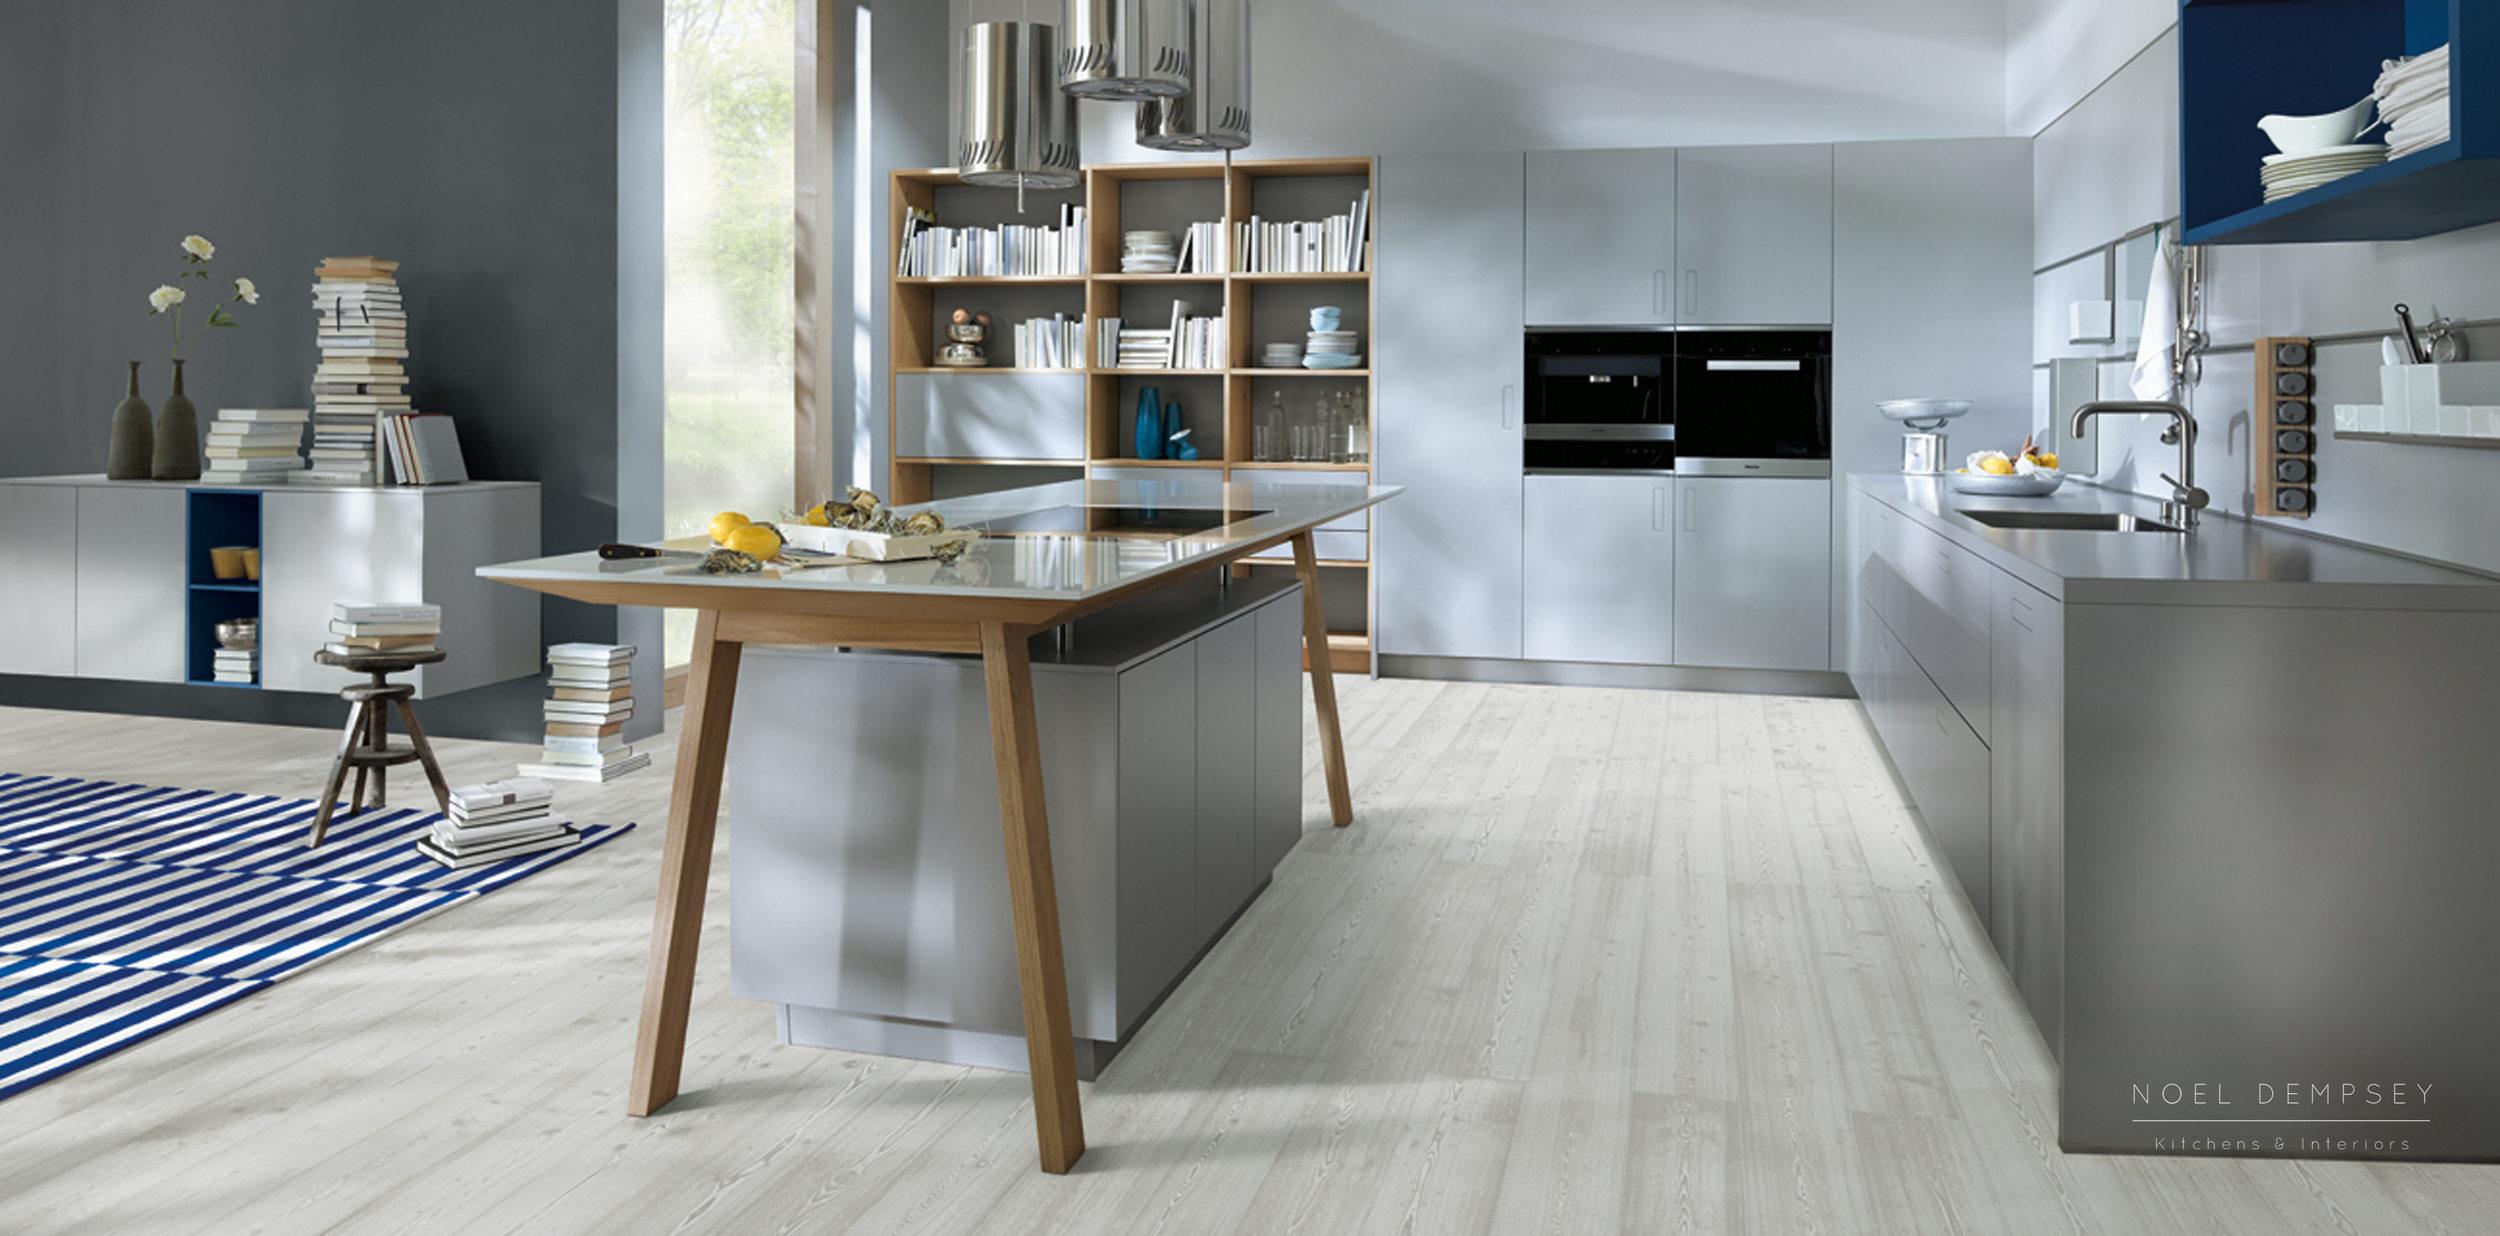 NX800-Stone-Grey-German-Kitchen-1.jpg